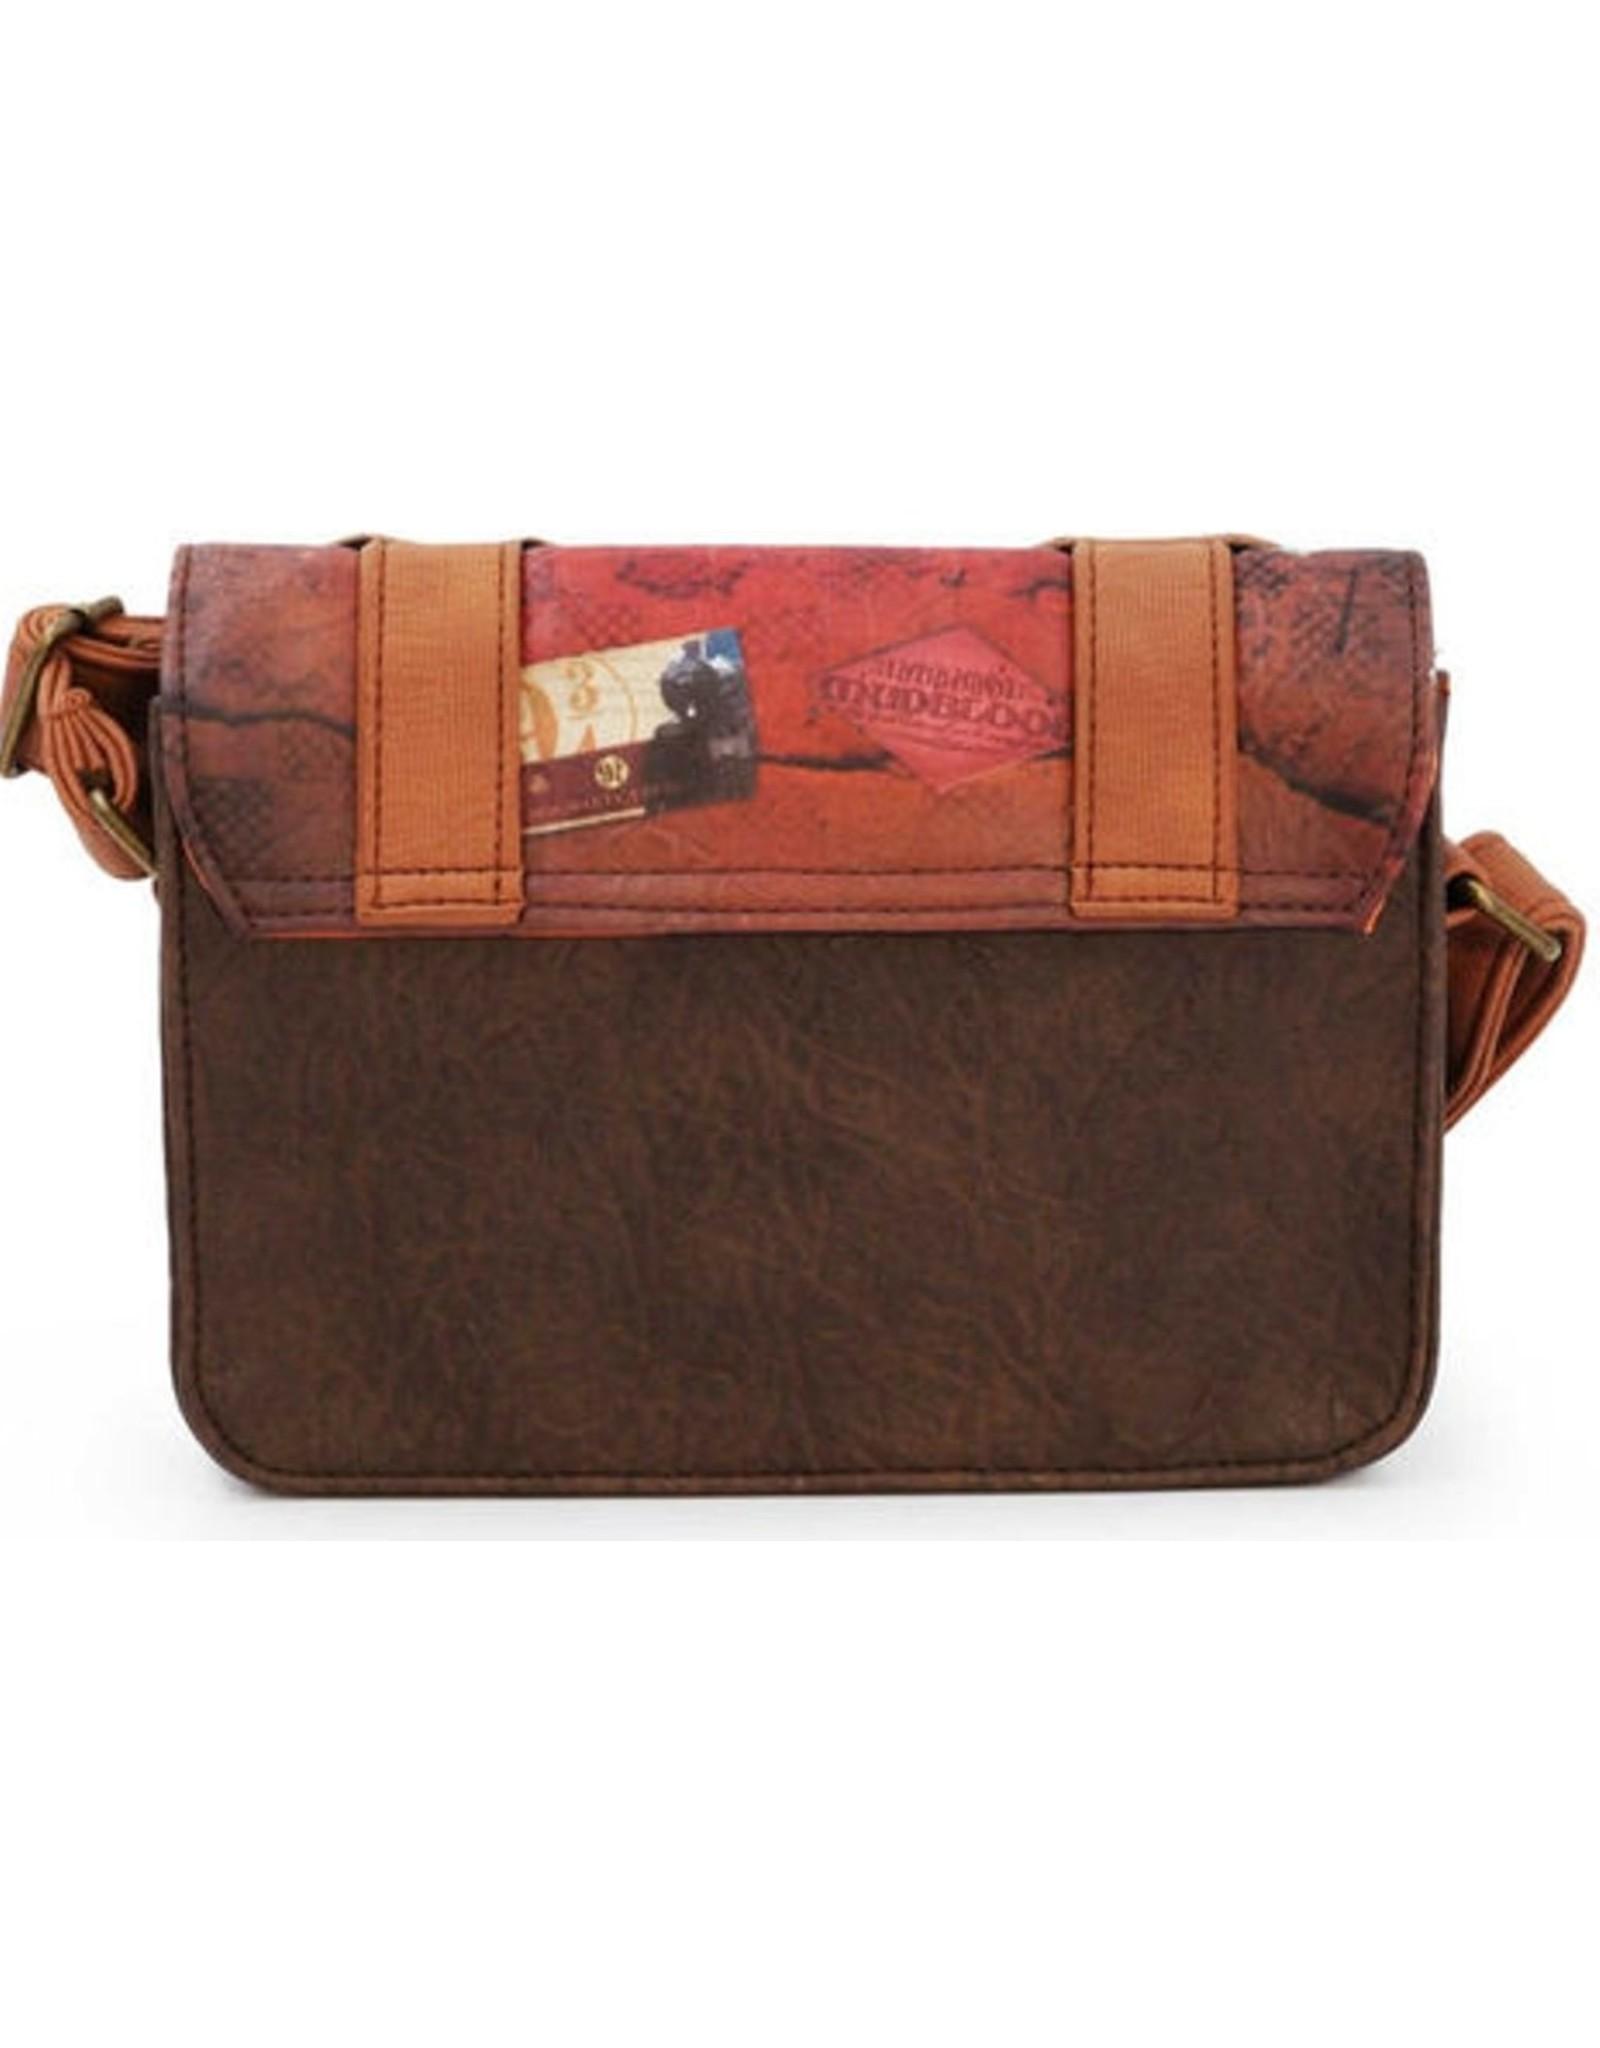 Katactermania Harry Potter bags - Harry Potter Hogwarts Express satchel bag